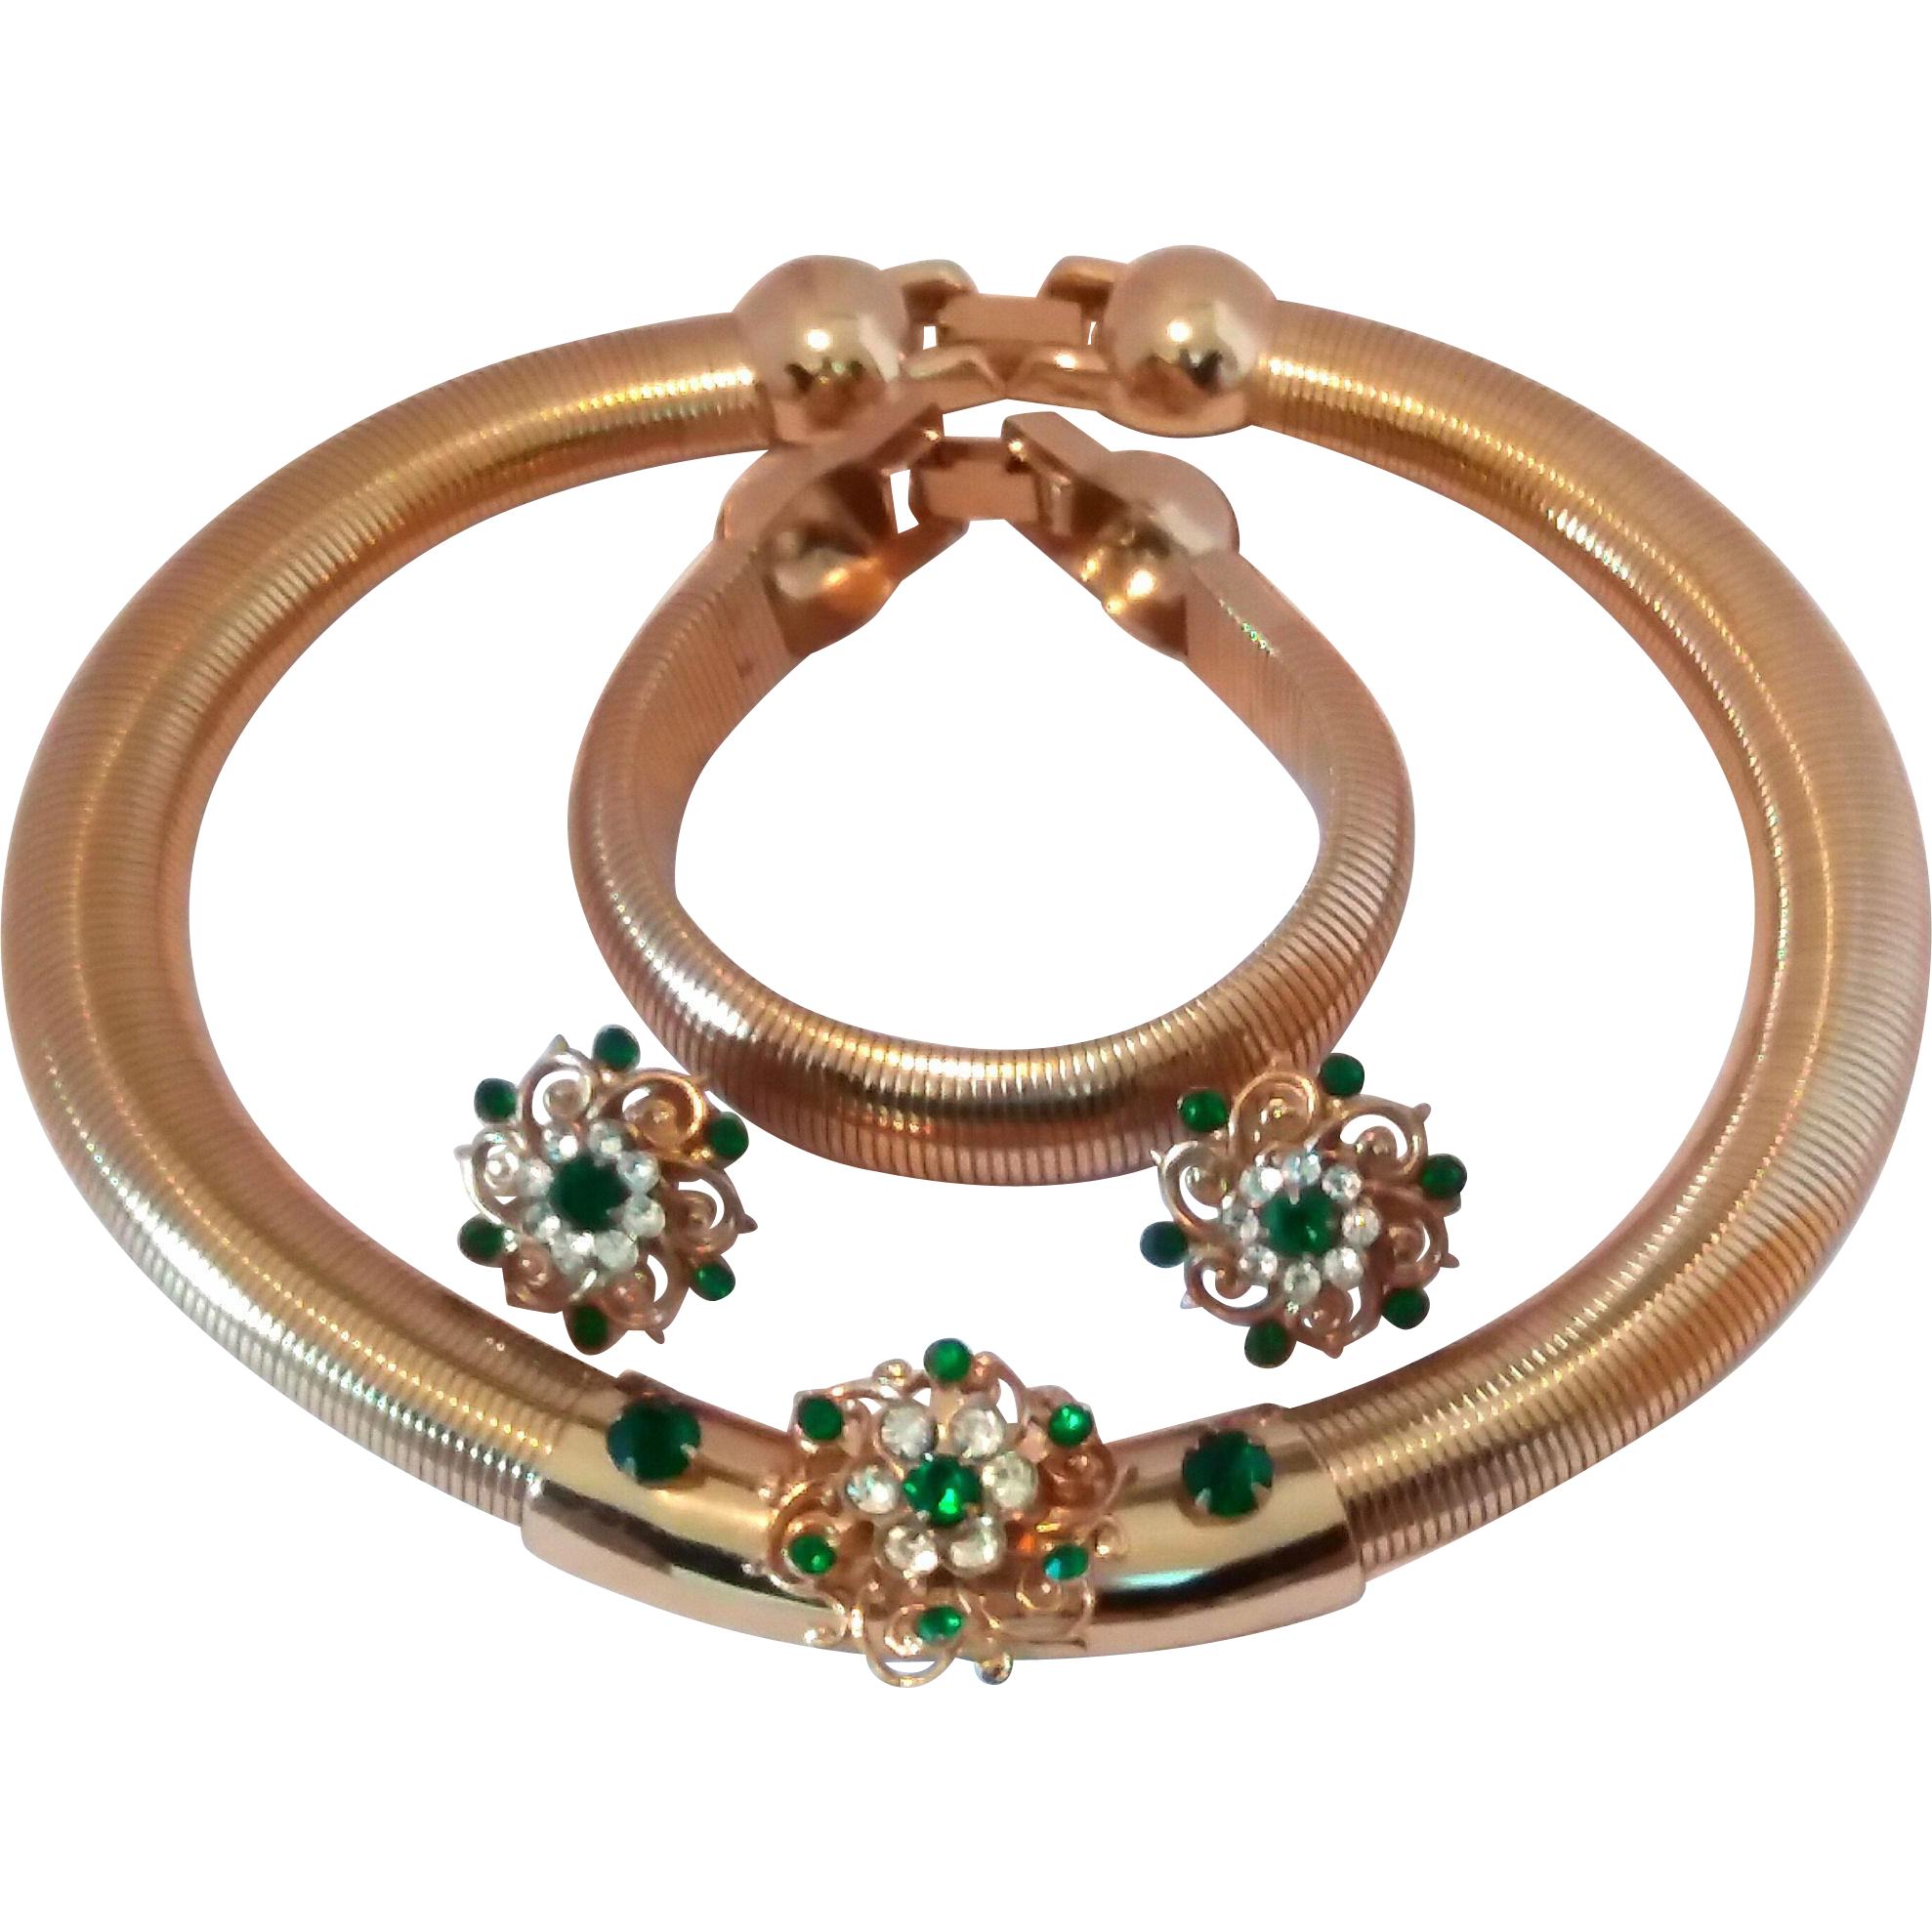 Karu New York Retro Gas Pipe Rhinestone Necklace Earrings Bracelet Set